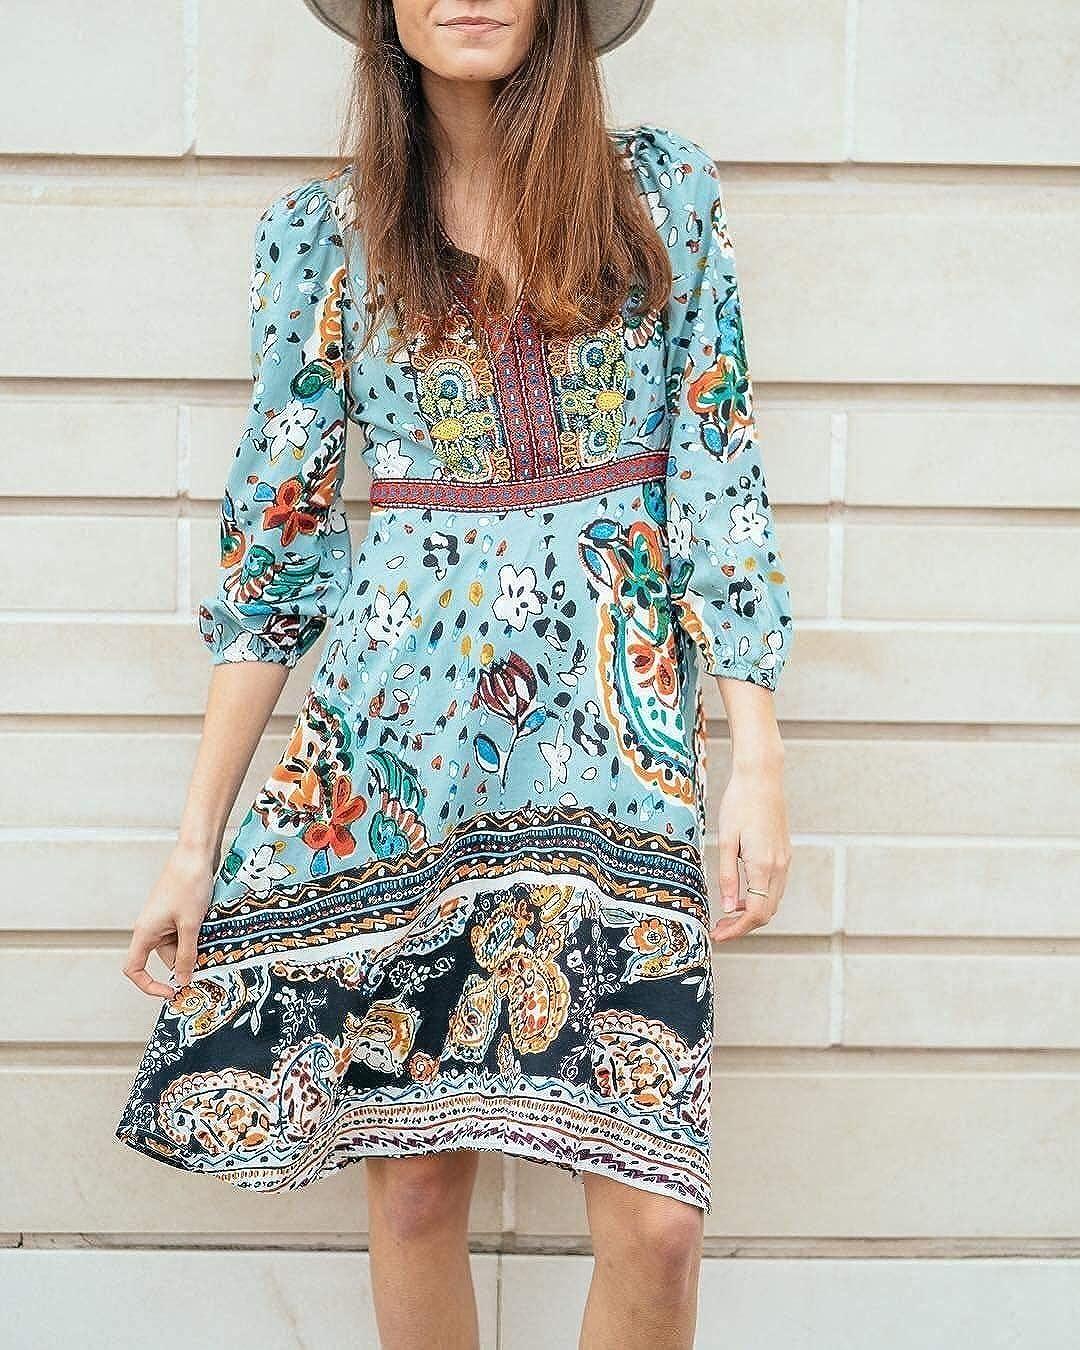 653e4e07d9de4 Anthropologie Beaded Karmina Dress by Akemi+Kin - NWOT (6) at Amazon  Women's Clothing store: